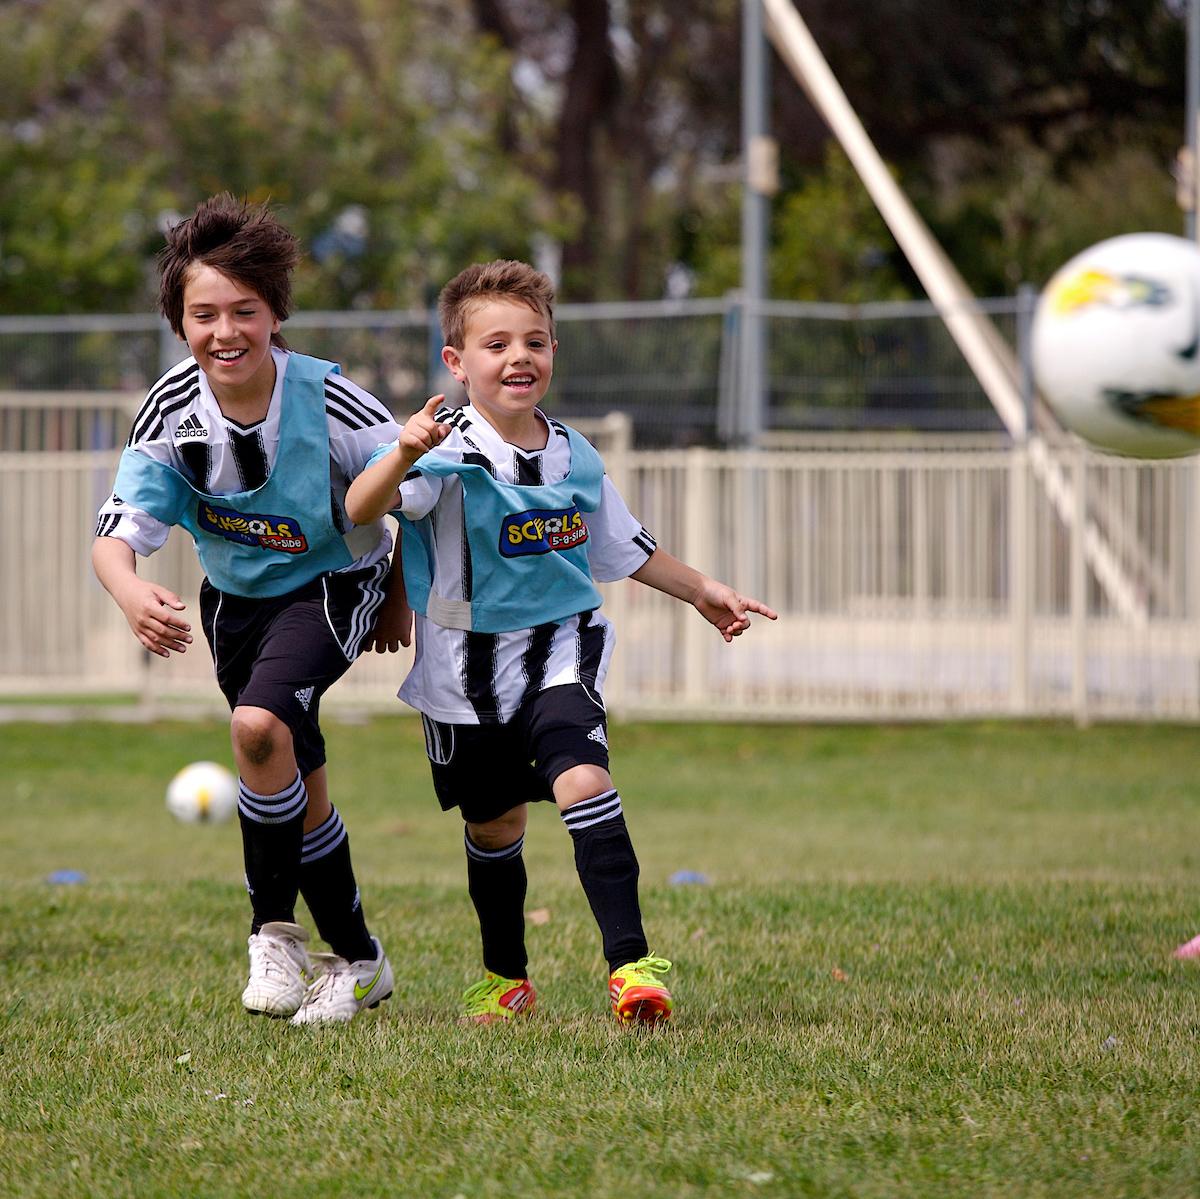 Client: Football Federation Victoria